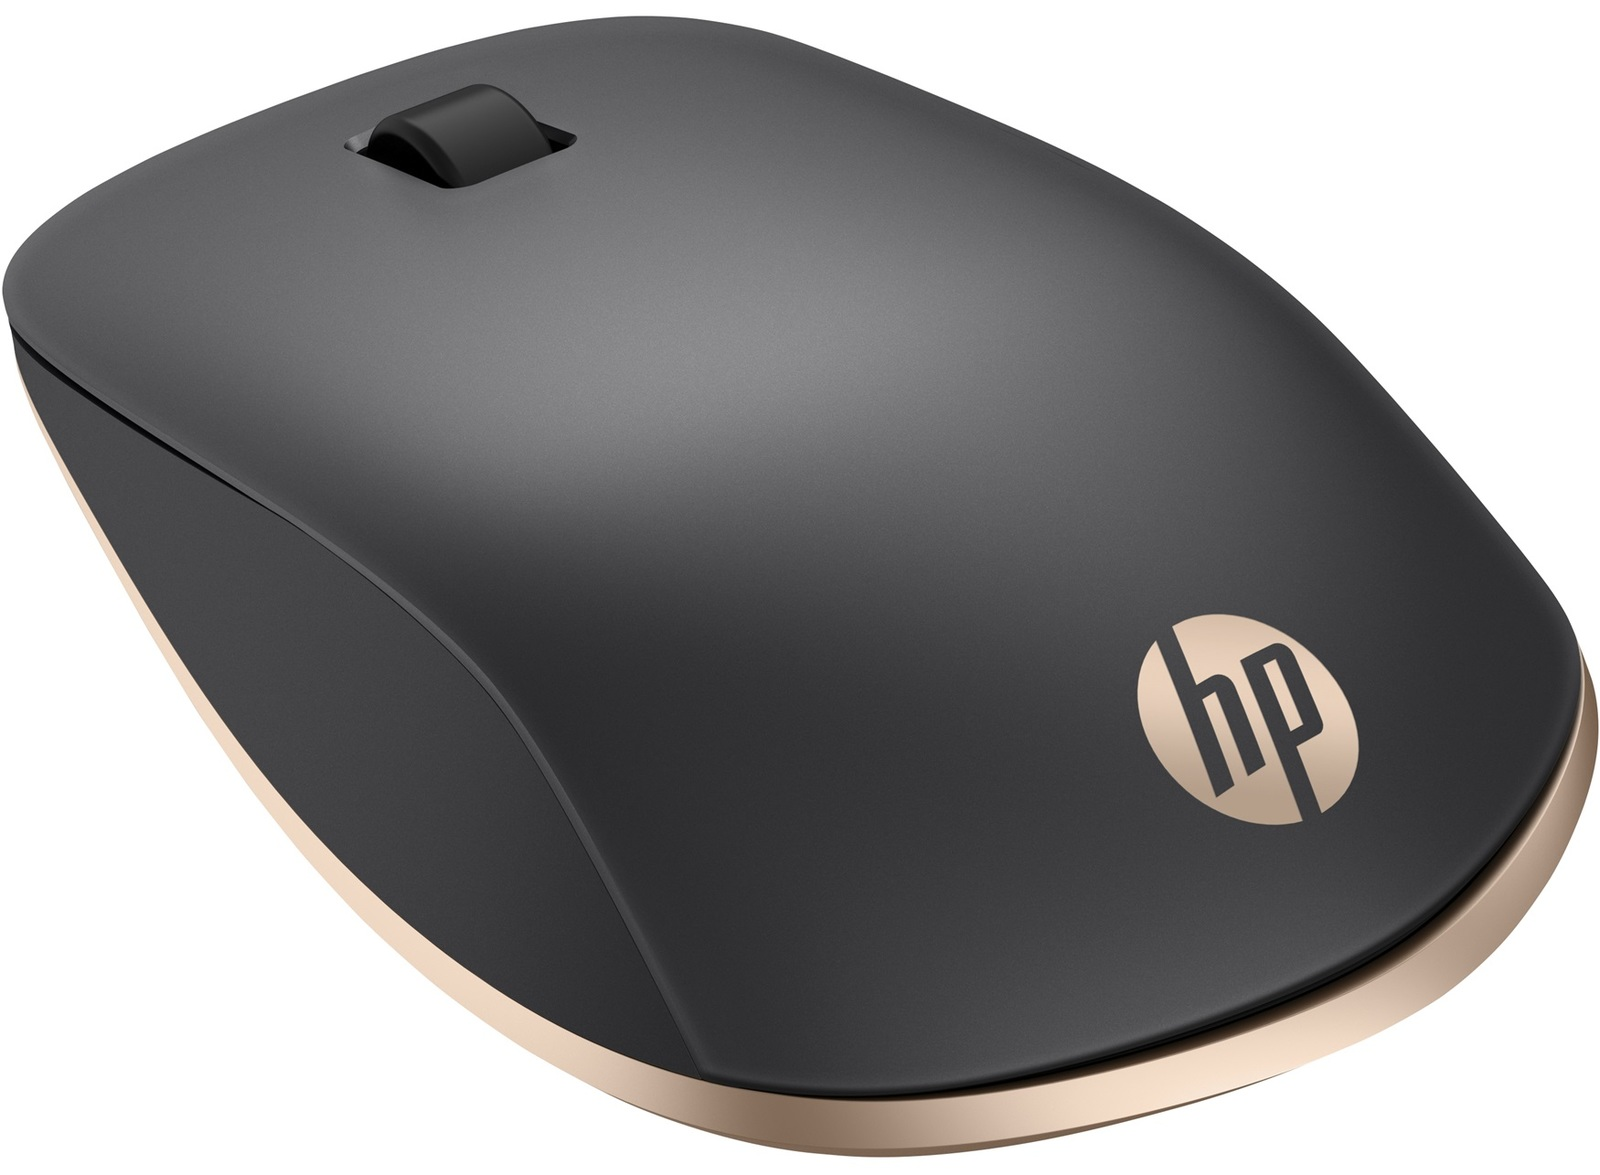 HP Z5000 Bluetooth Mouse (Dark Ash) image